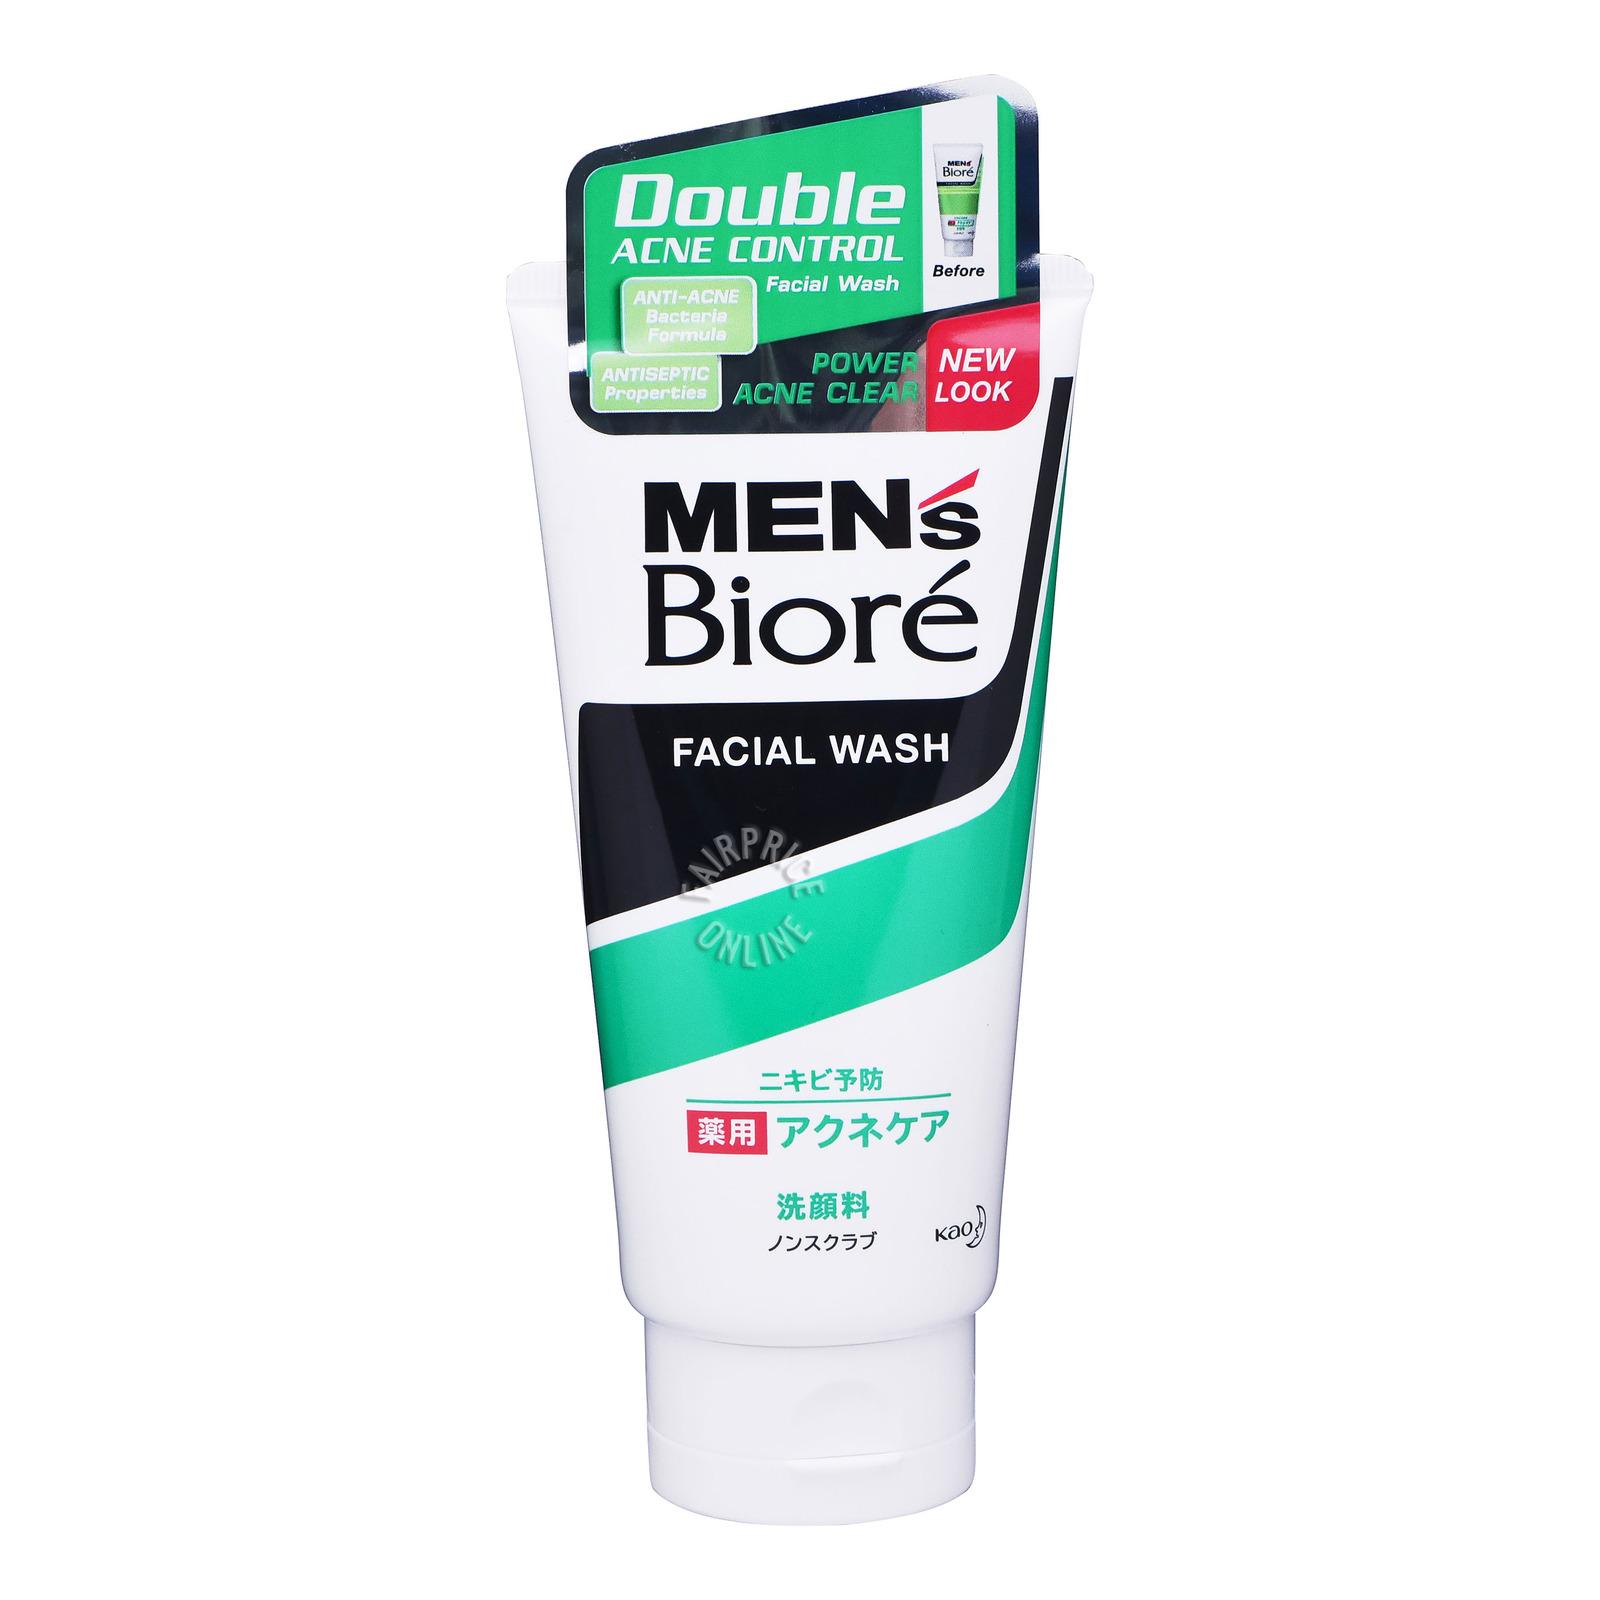 Biore Men's Facial Wash - Double Acne Control